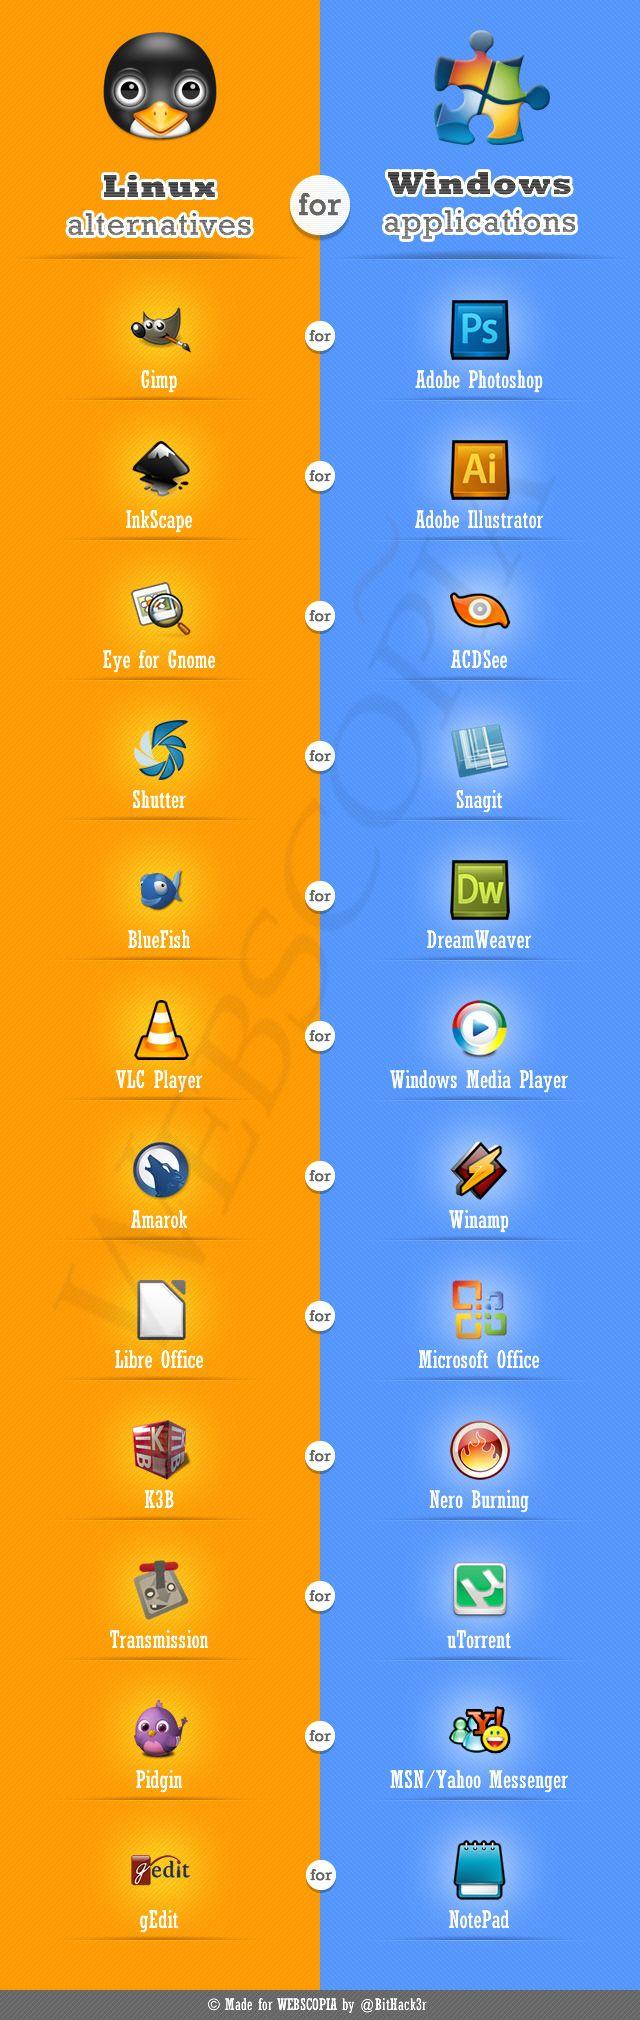 Ubuntulandia: Alternative Linux per applicazioni Windows [Infografica].